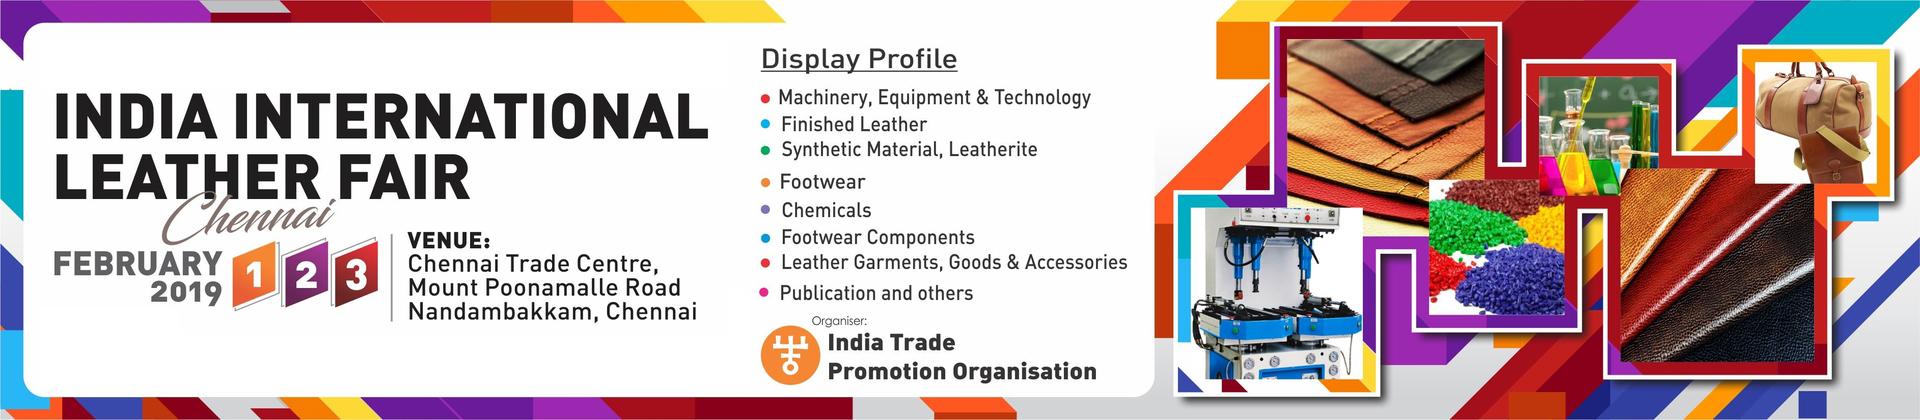 IILF 2019 / CHENNAI / India